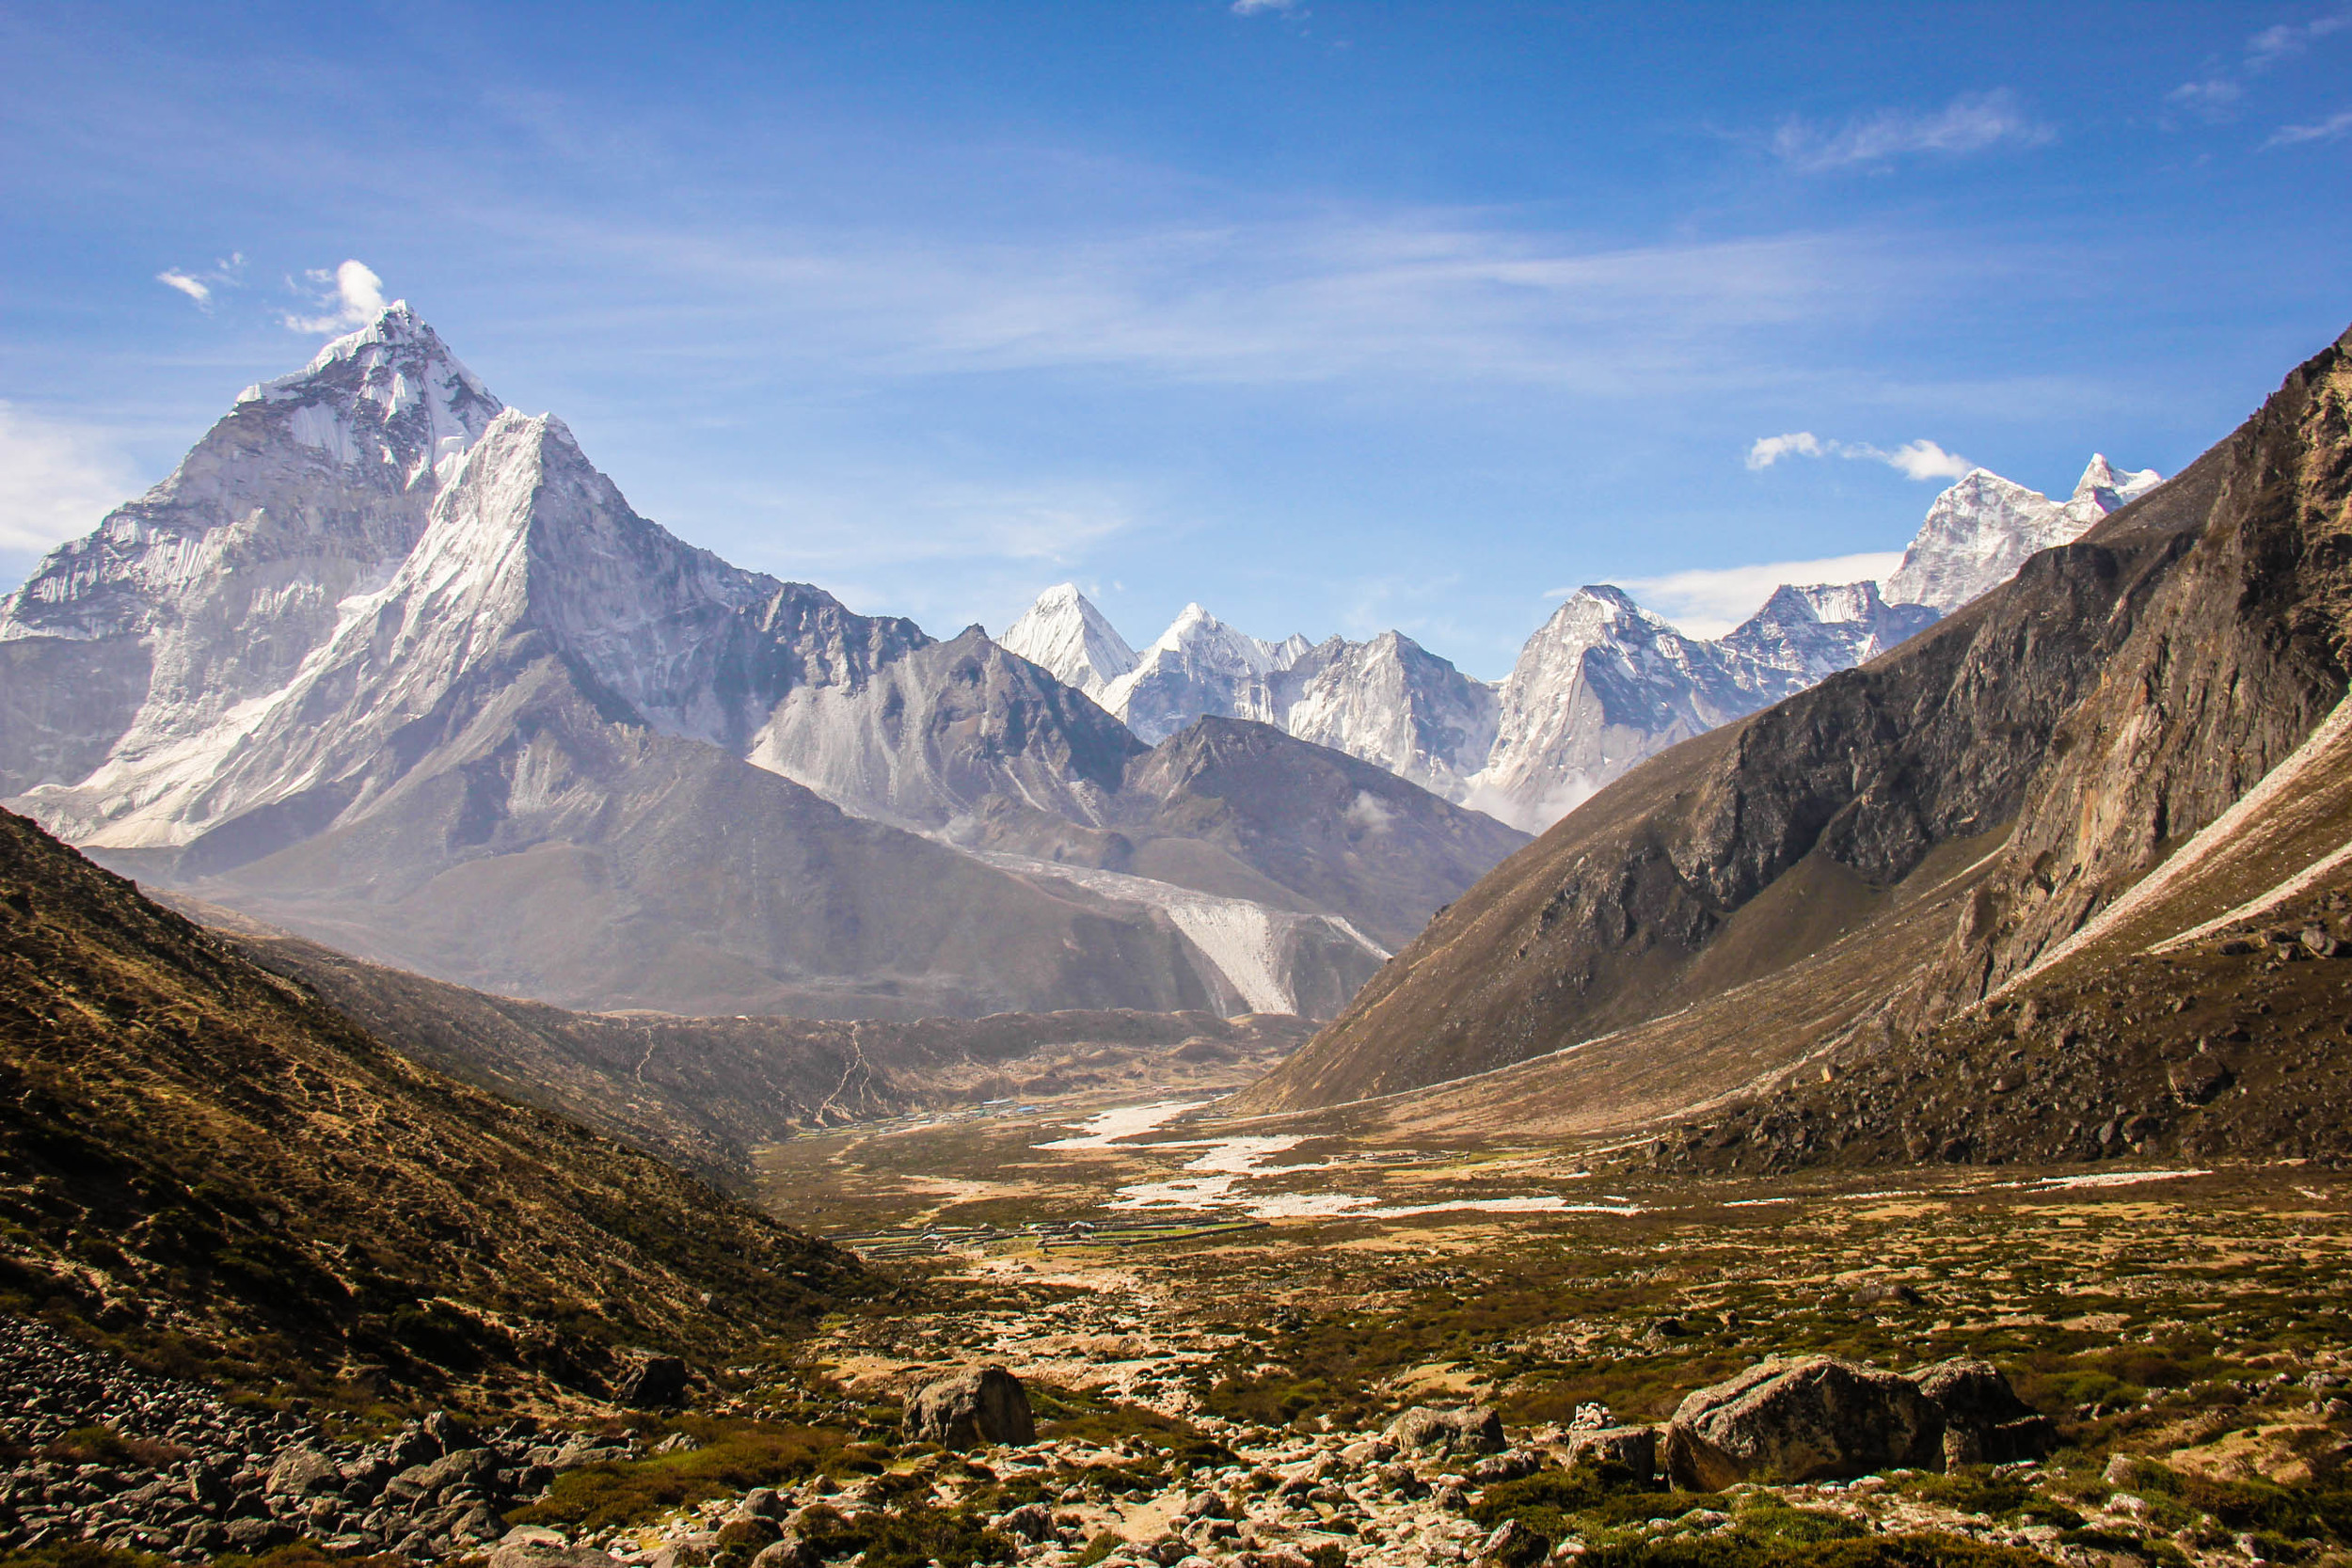 The trek to Everest Basecamp